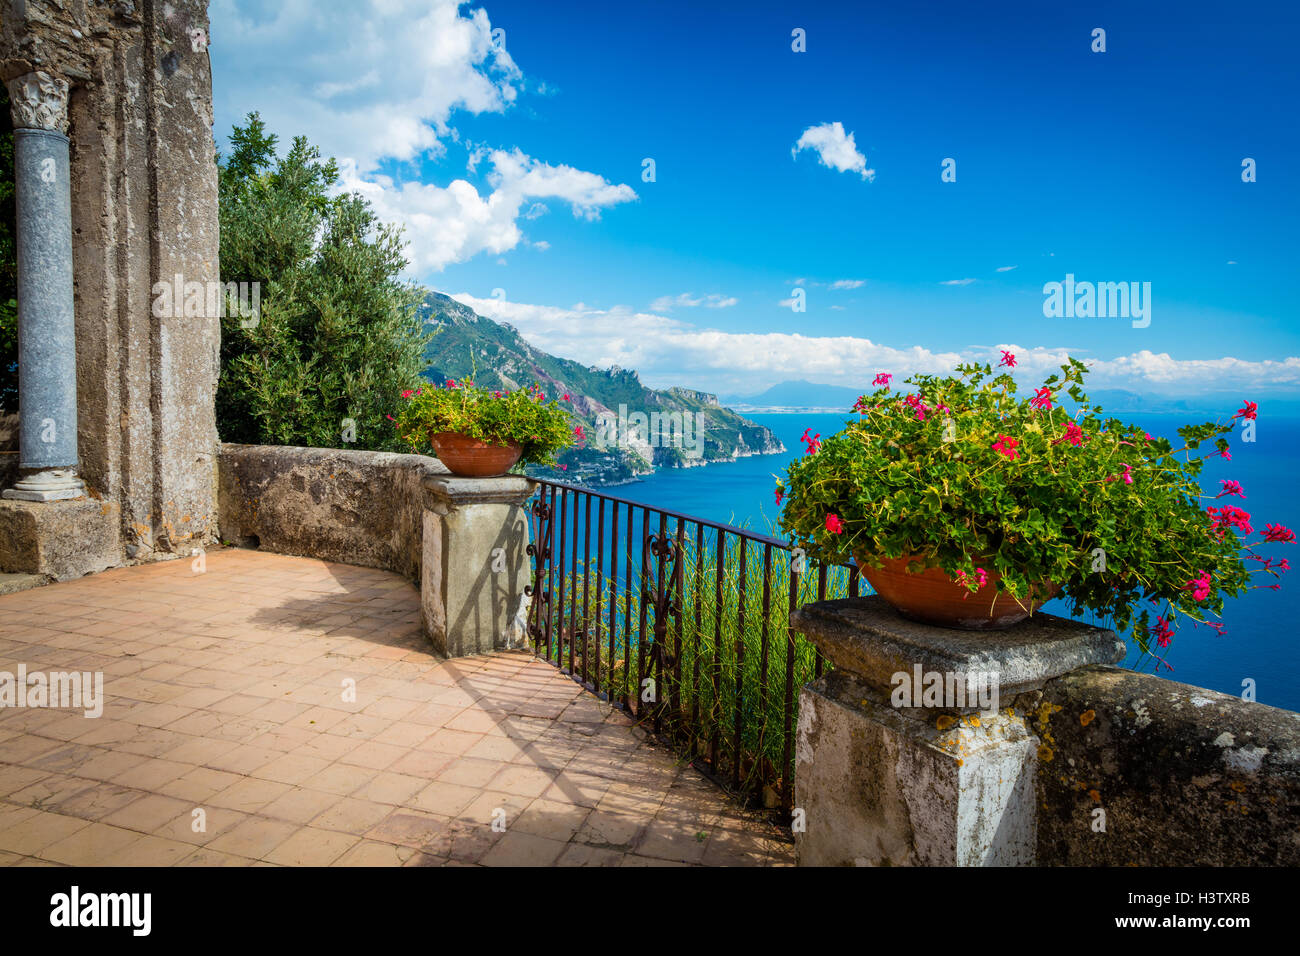 Villa Cimbrone ist ein historisches Gebäude in Ravello an der Amalfiküste Süditalien. Stockbild